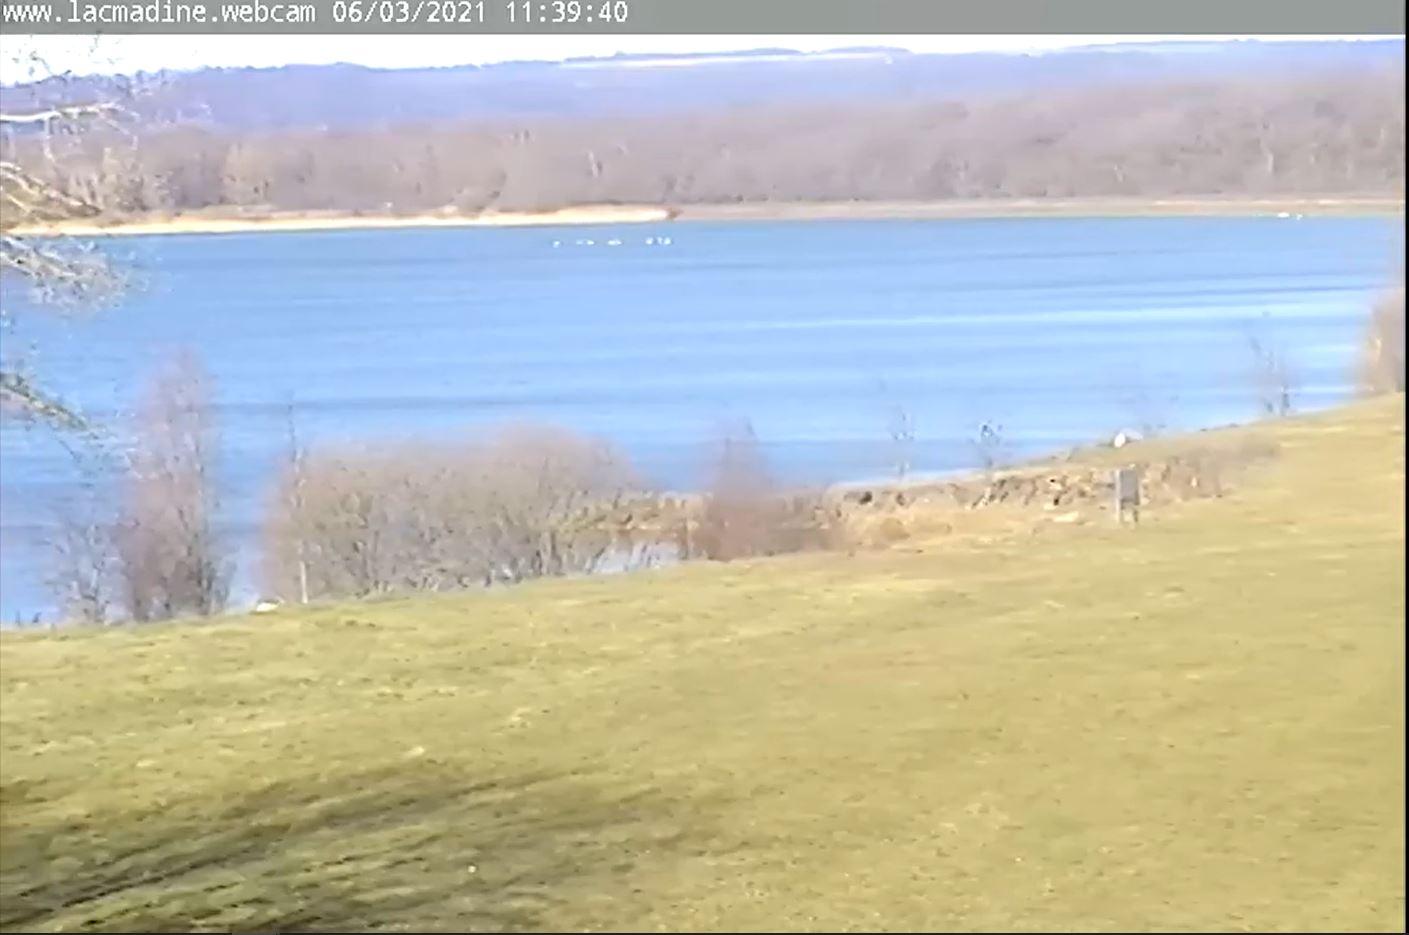 webcam Lac de Madine